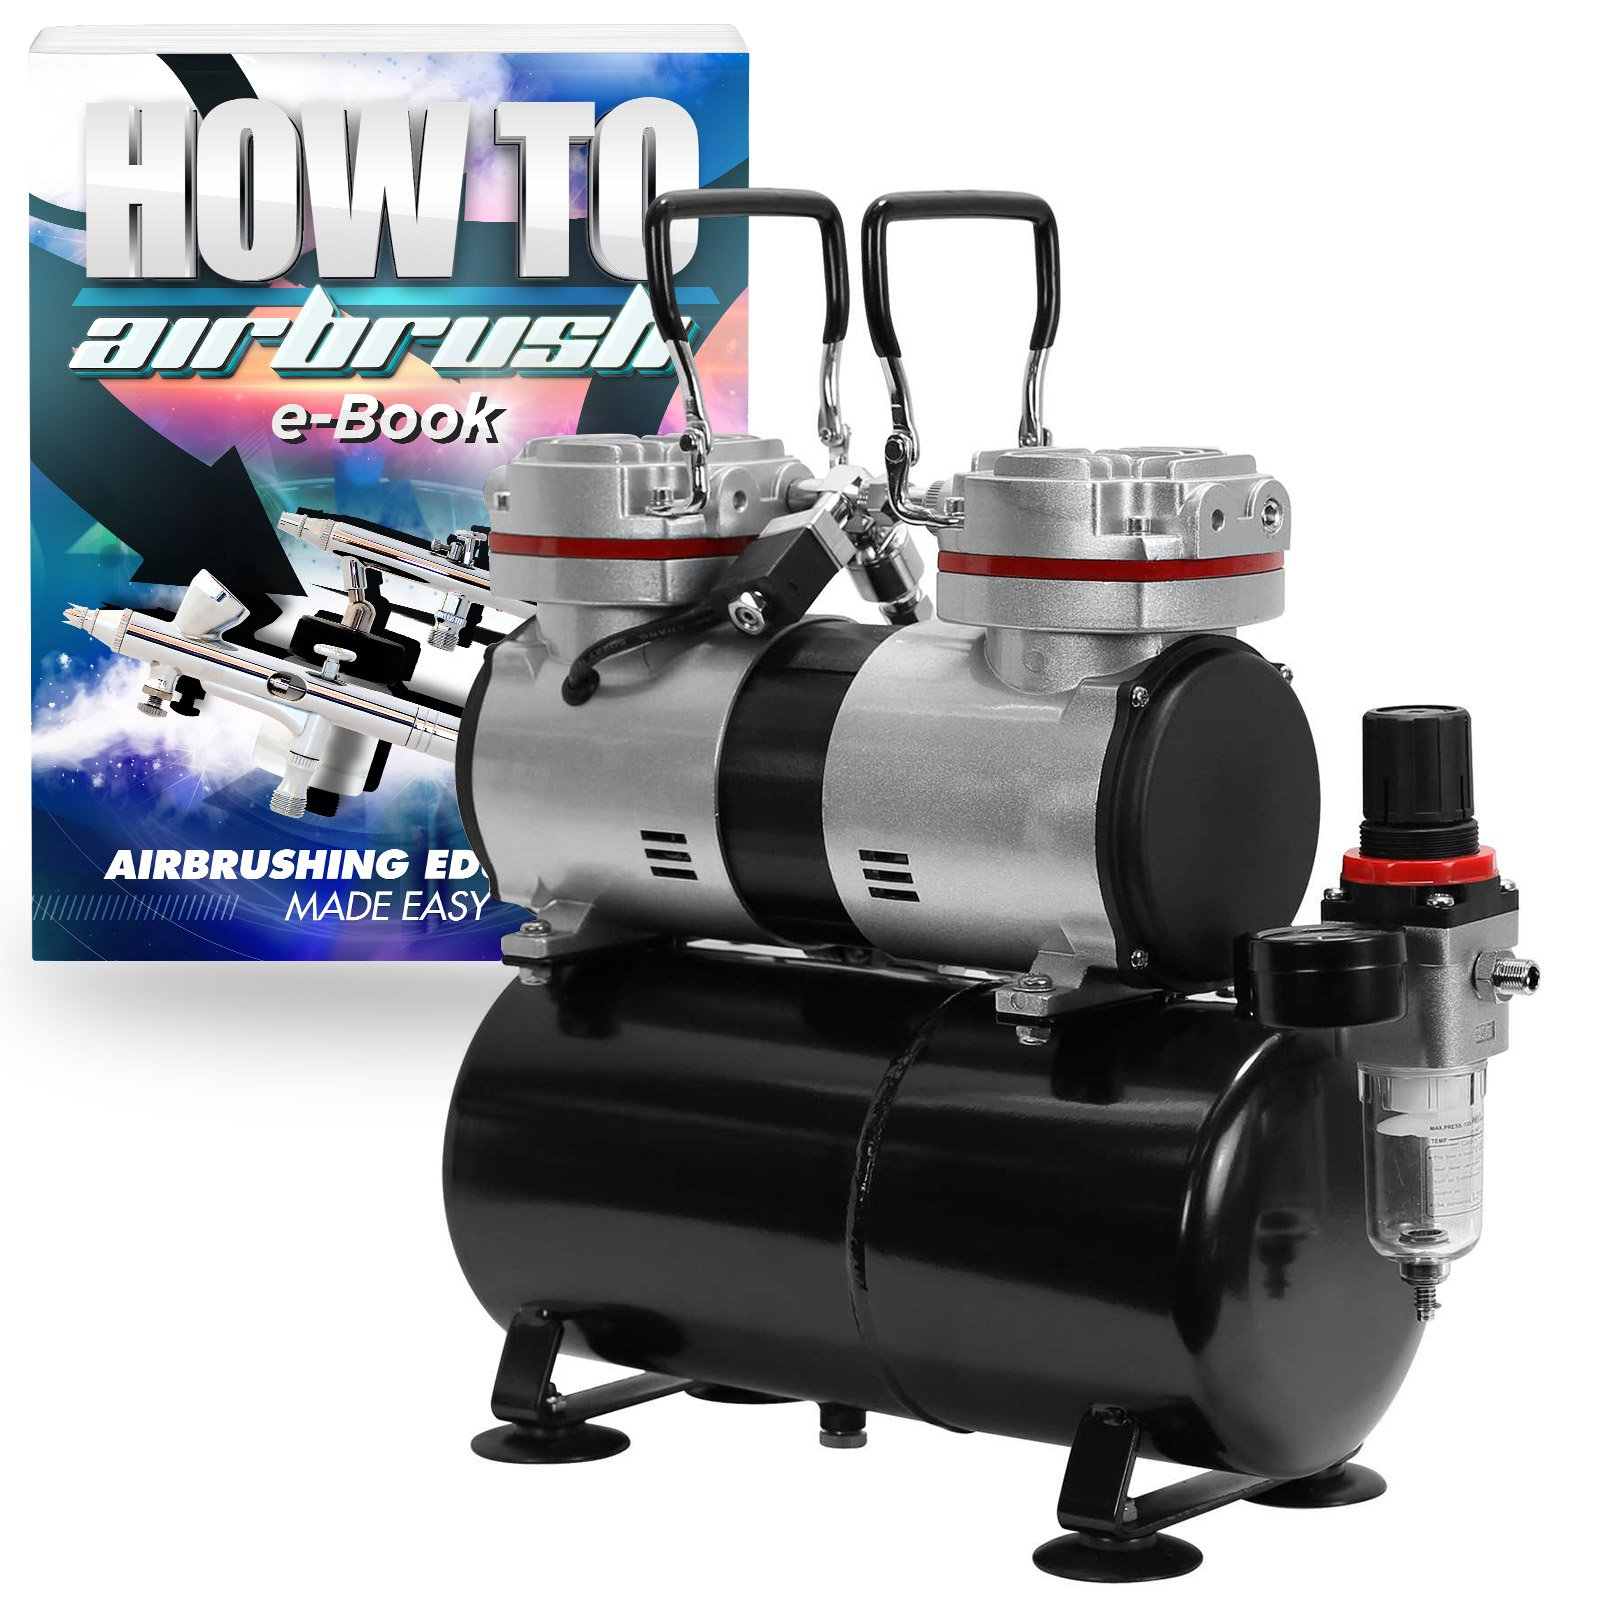 PointZero Pro Airbrush Air Compressor Twin Piston w/ Tank 1/3 HP